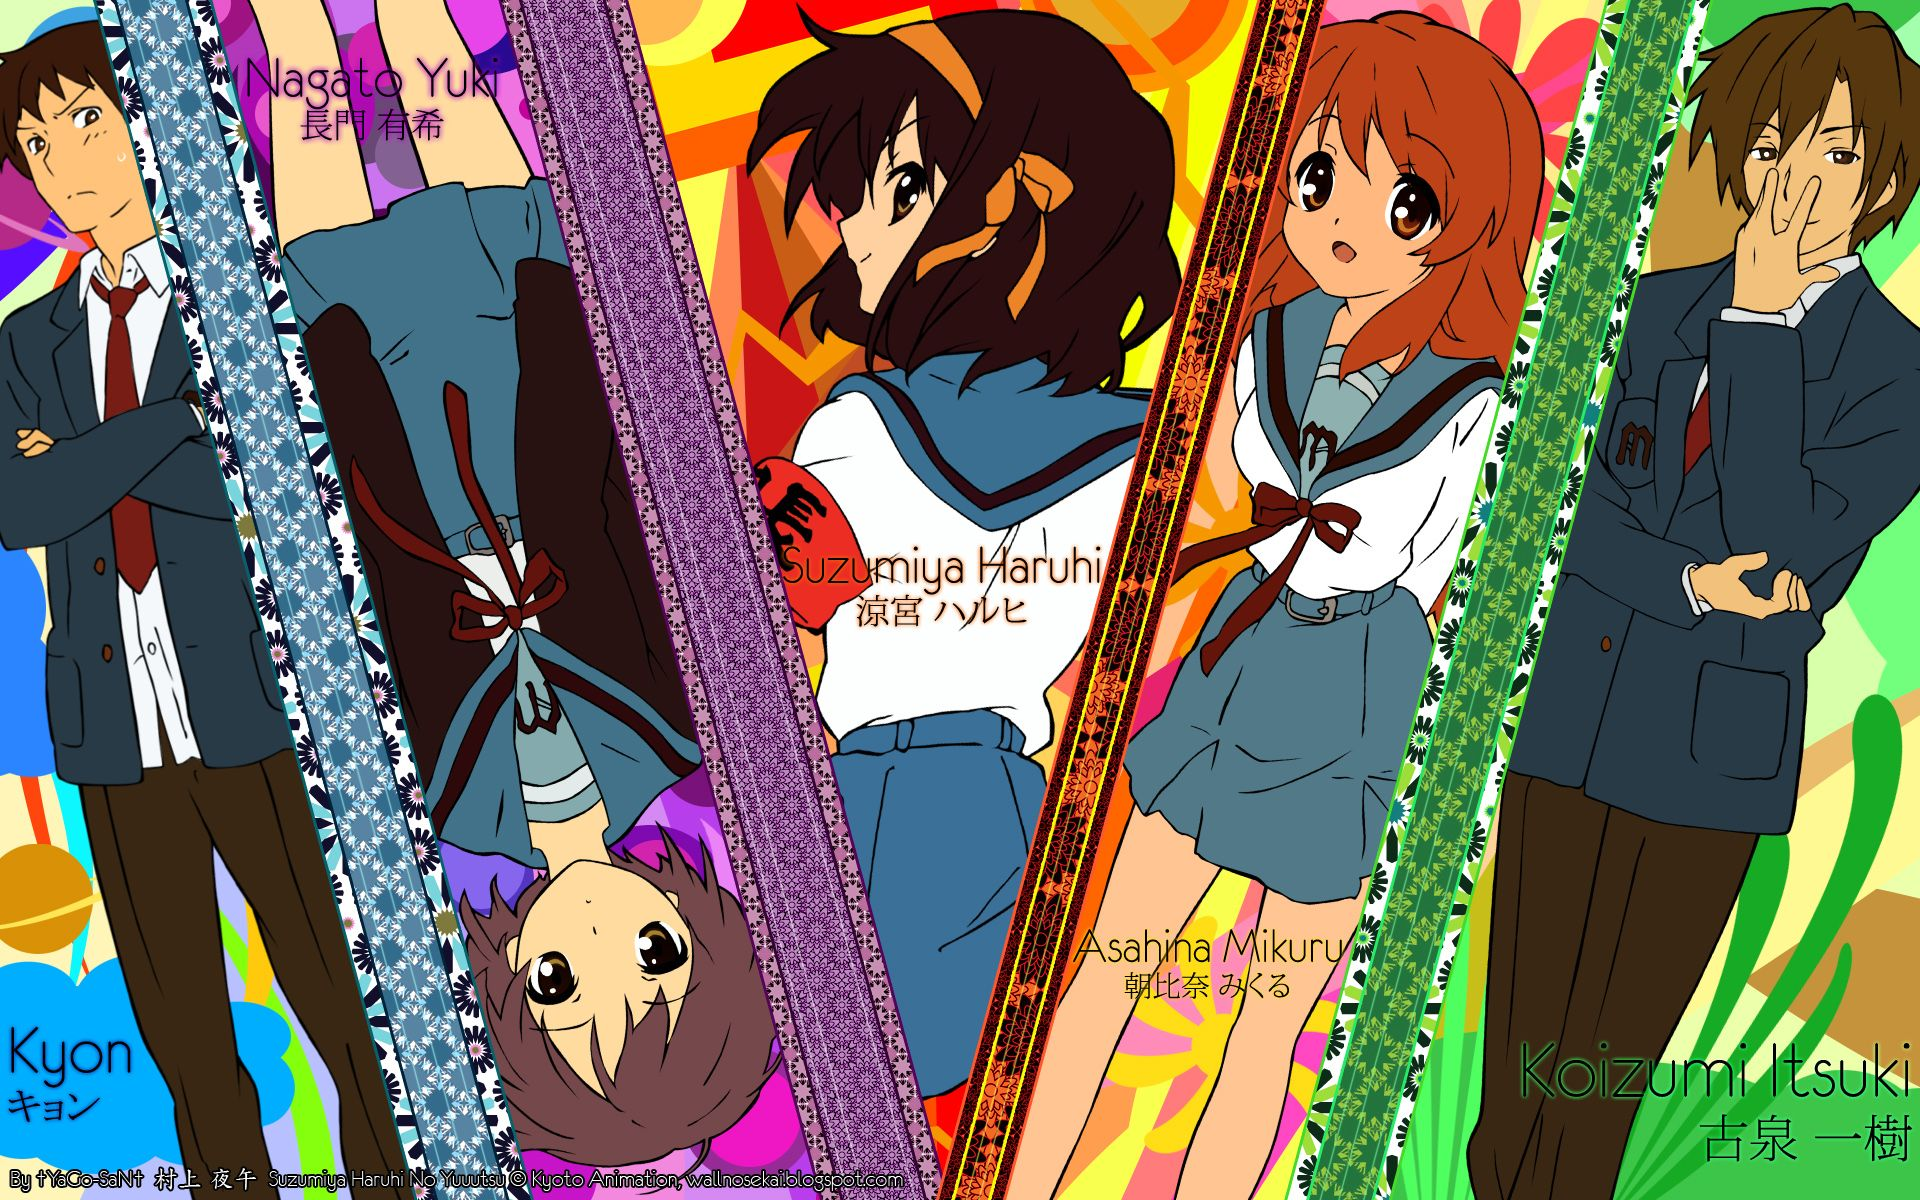 The Melancholy Of Haruhi Colours The Melancholy Of Haruhi